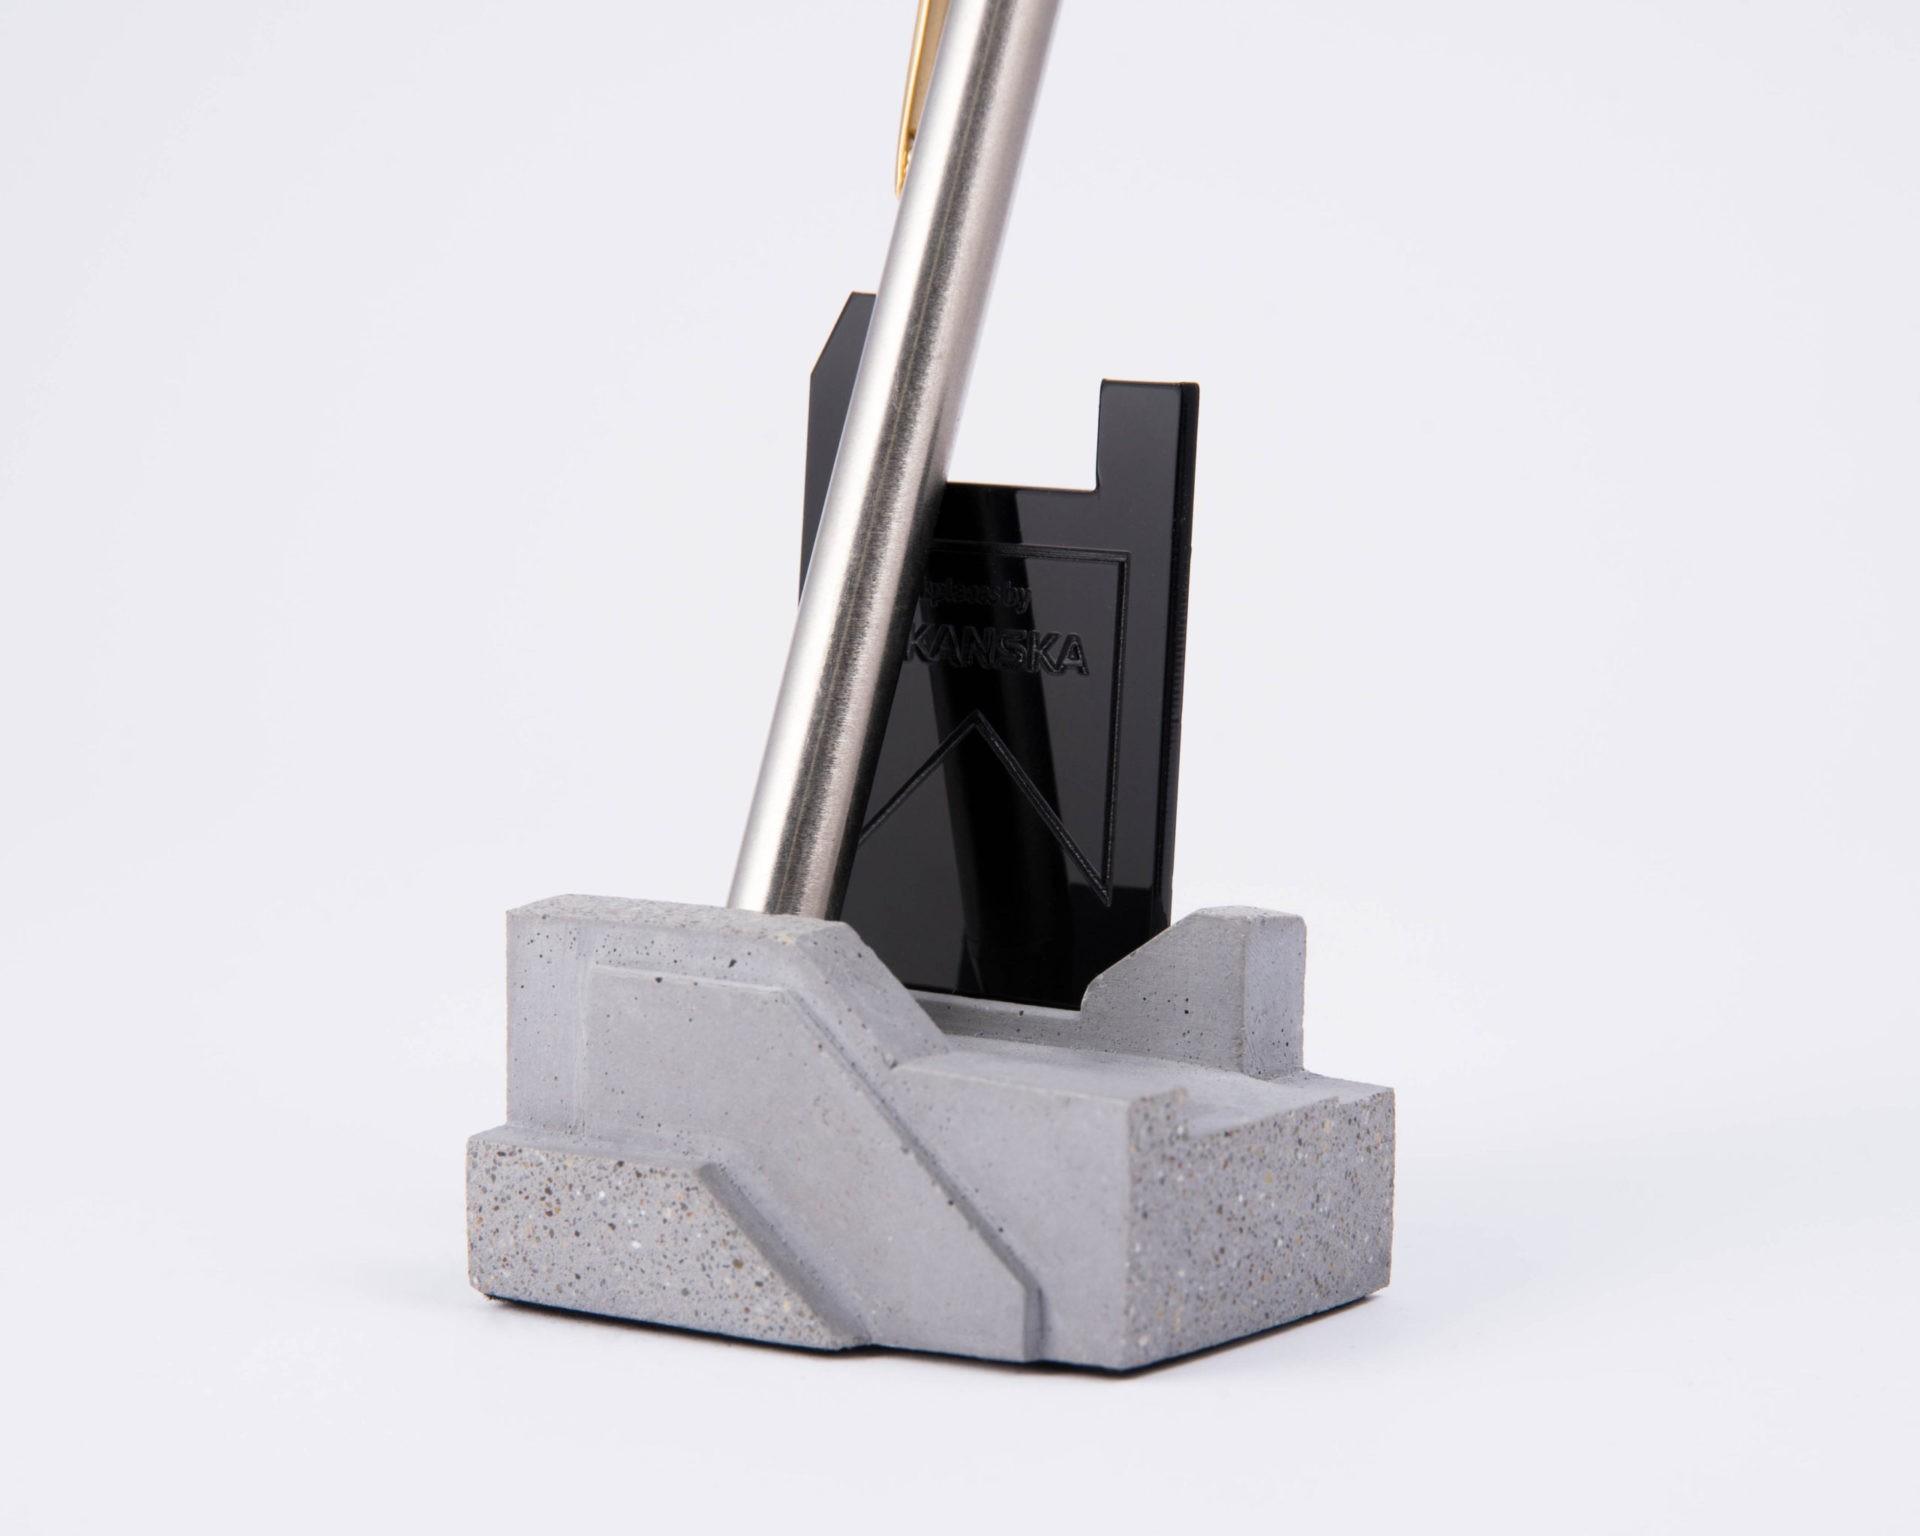 Terrazzo concrete pen holder as corporate gift for Skanska